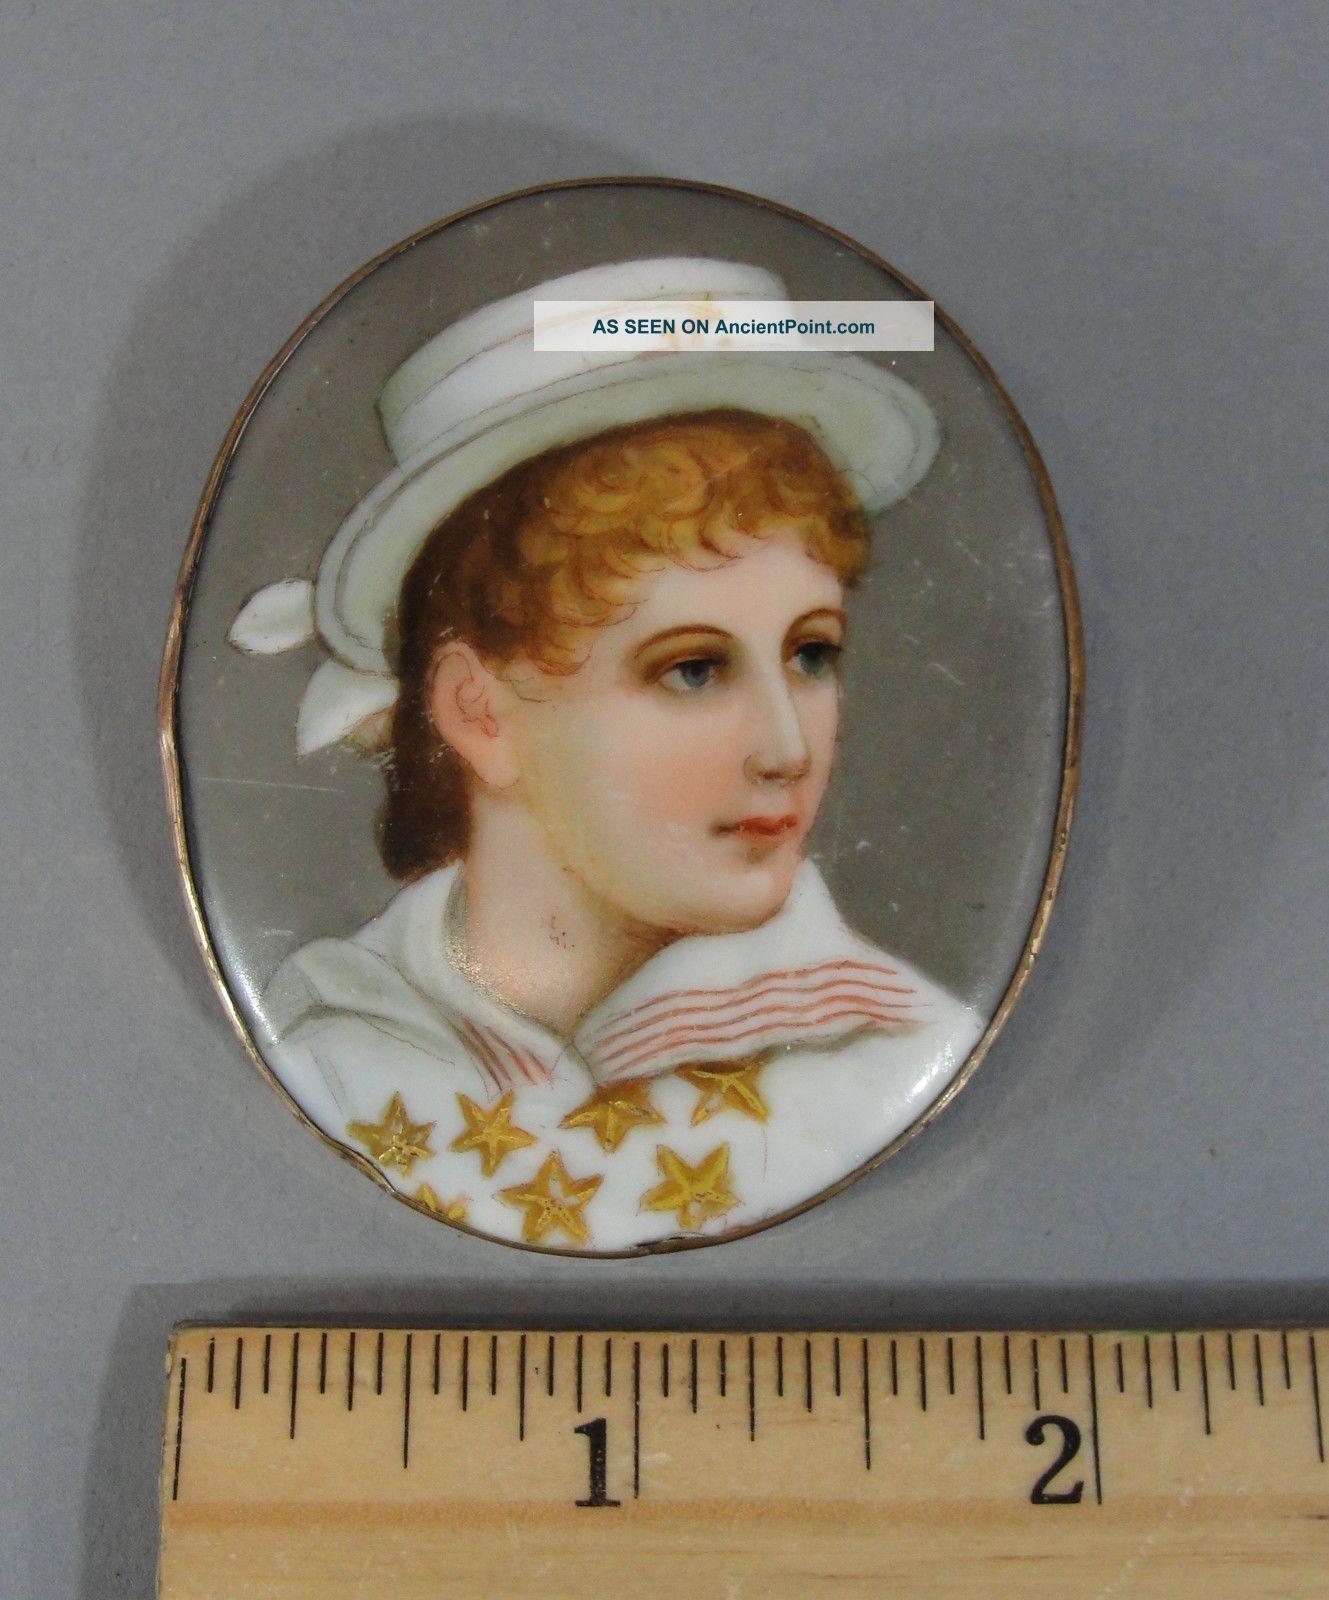 Antique Victorian Miniature Porcelain Portrait Painting Girl Sailor Outfit Pin Other Maritime Antiques photo